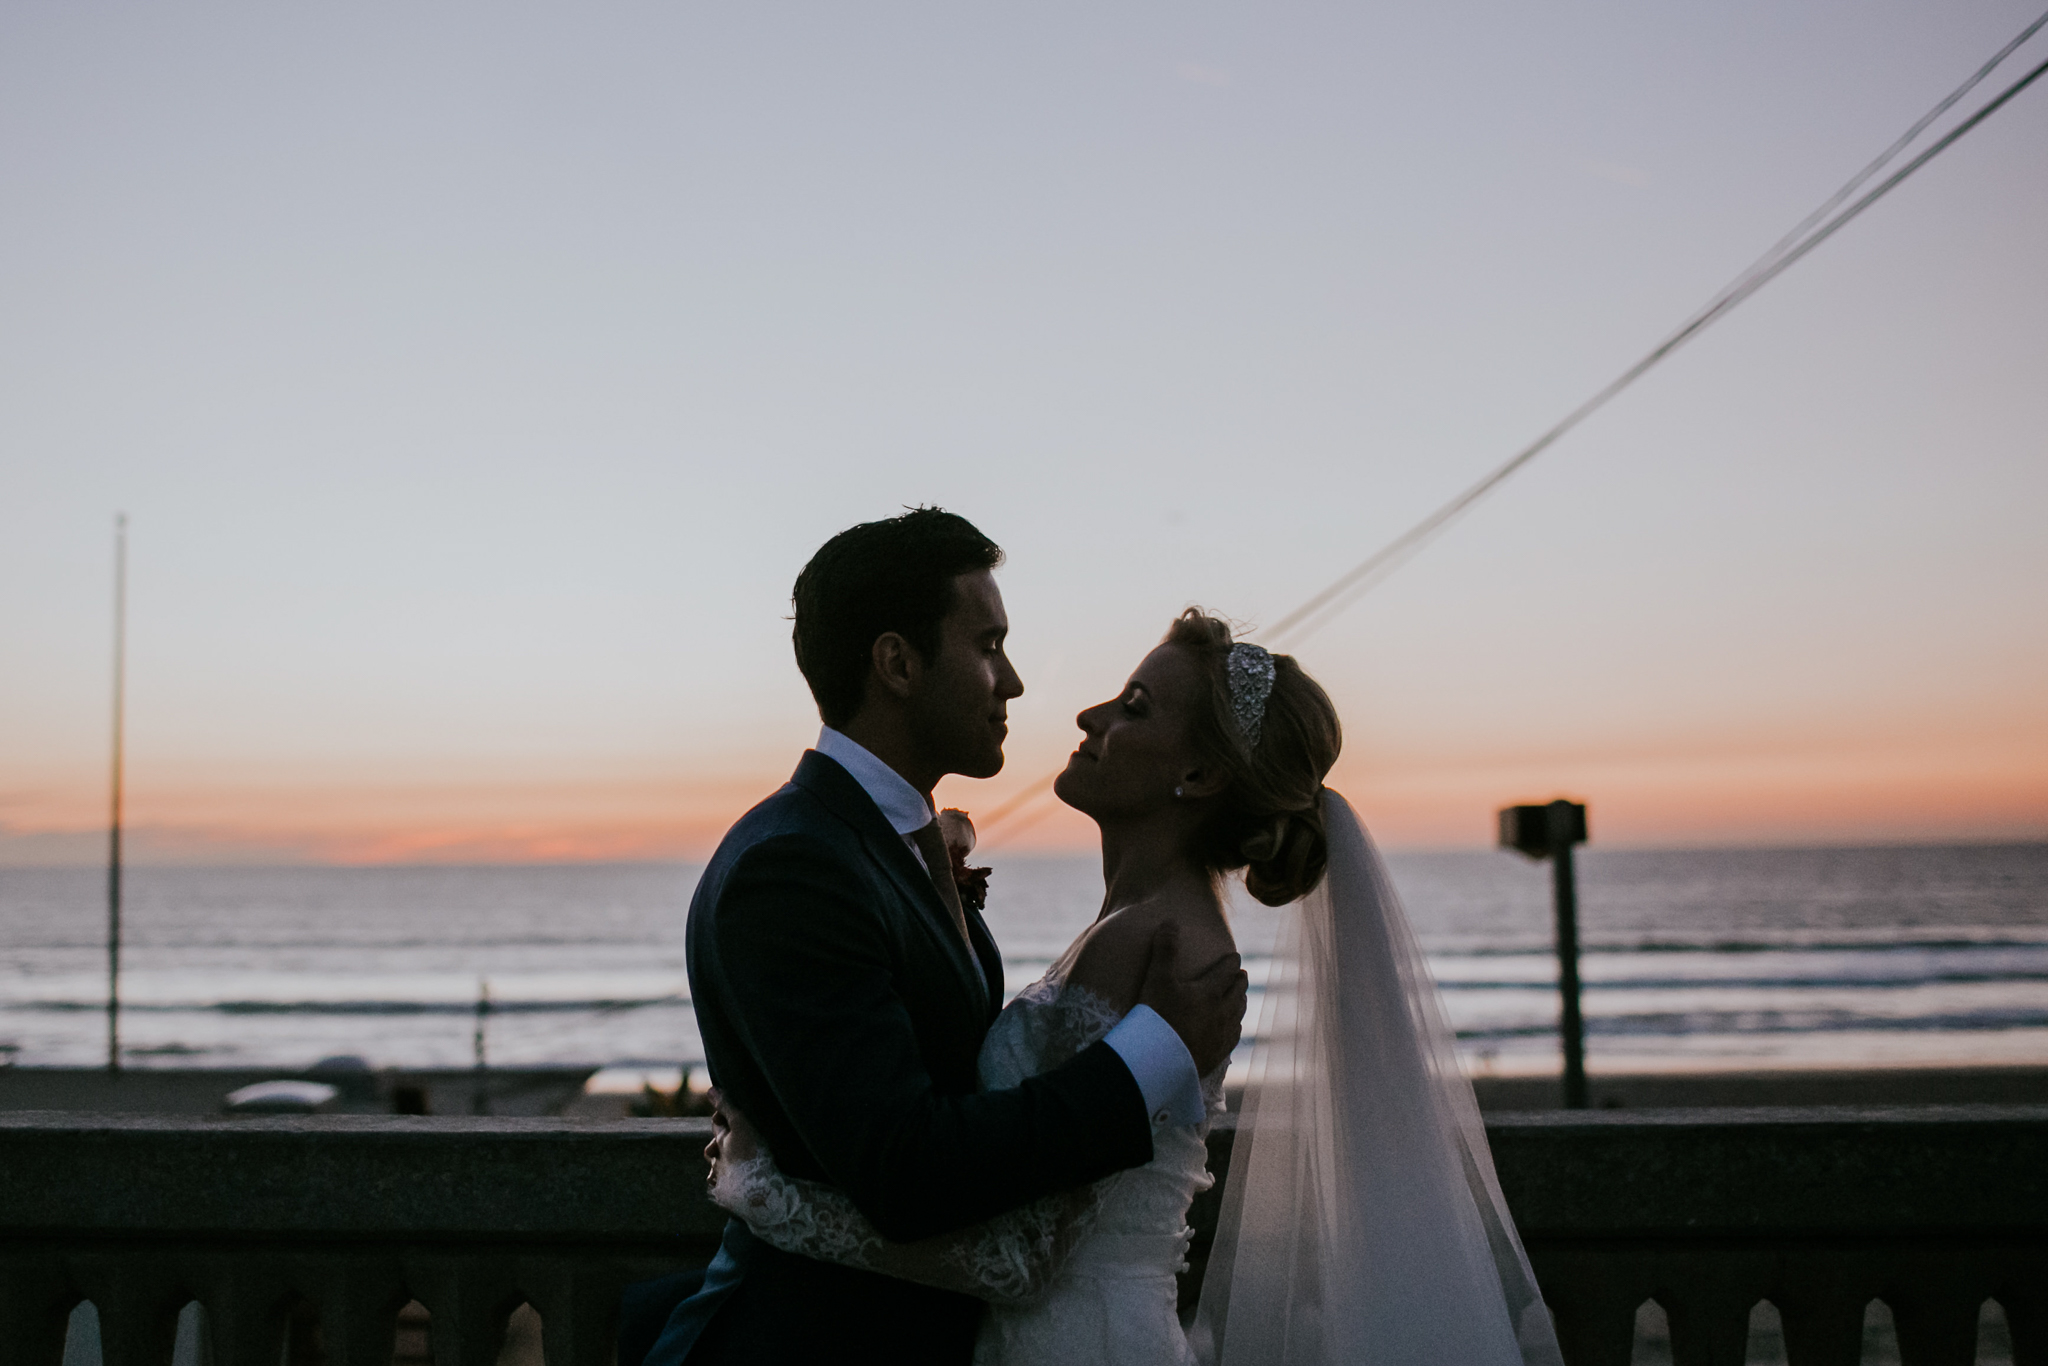 20151230_hussem_wedding_0690_web.jpg